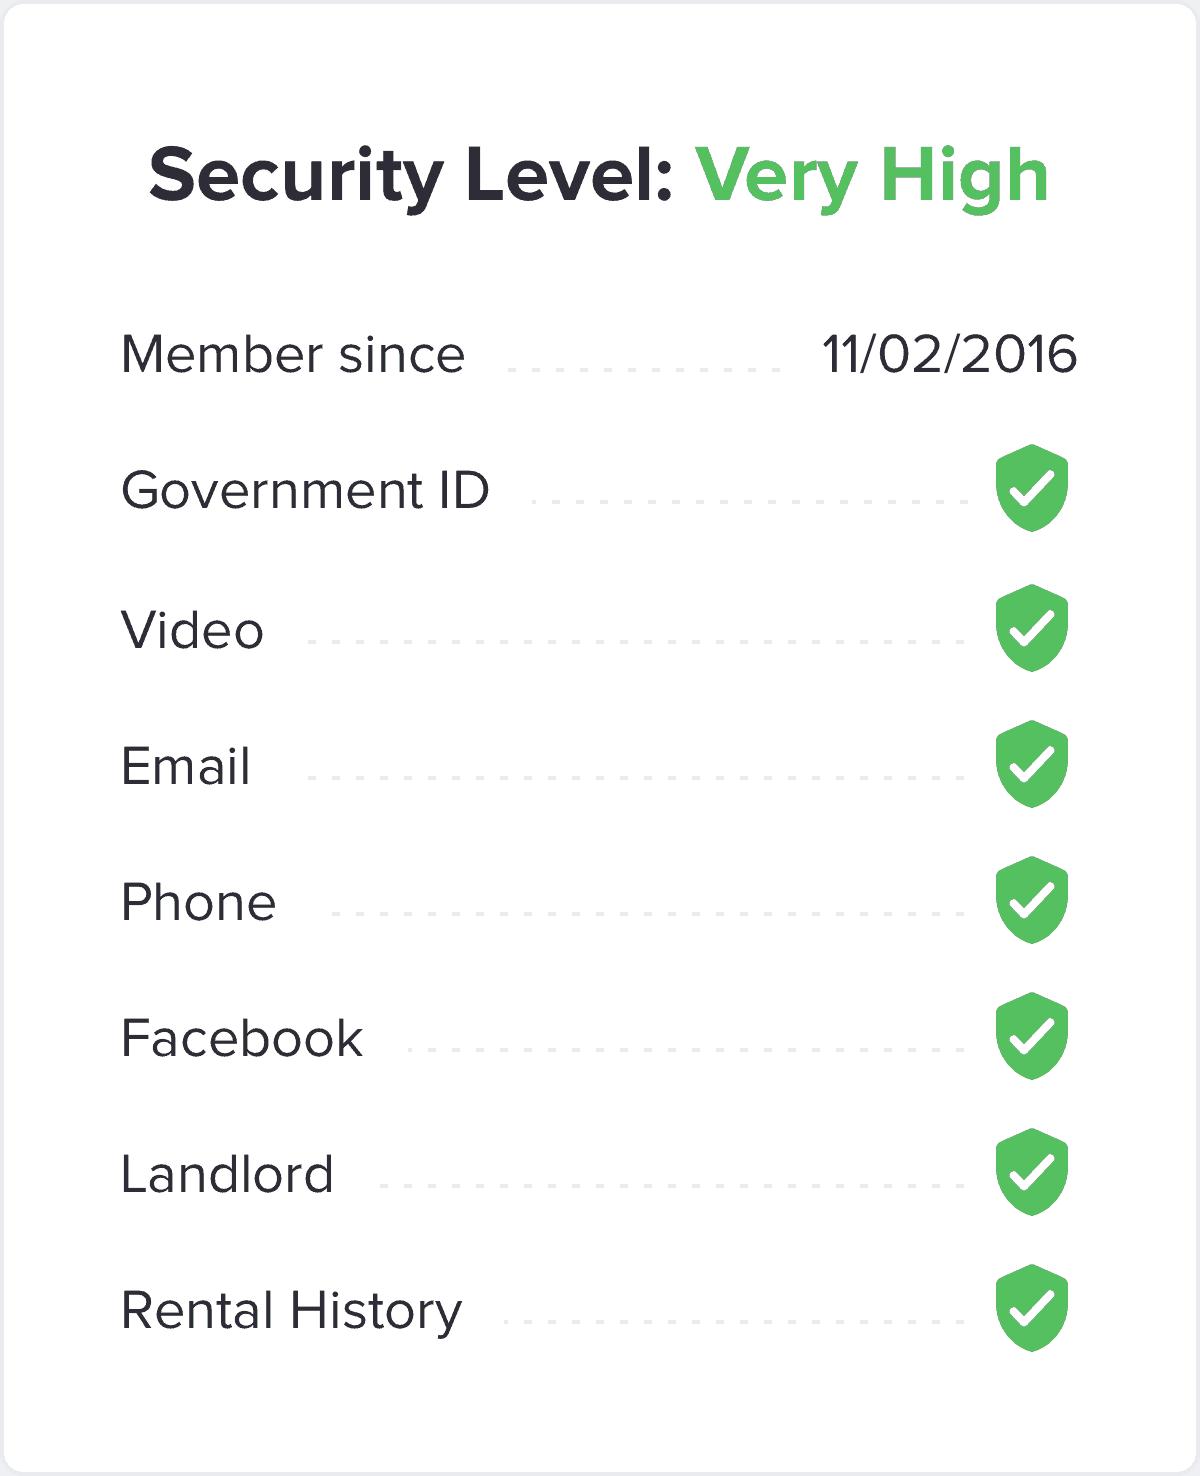 Security level analysis